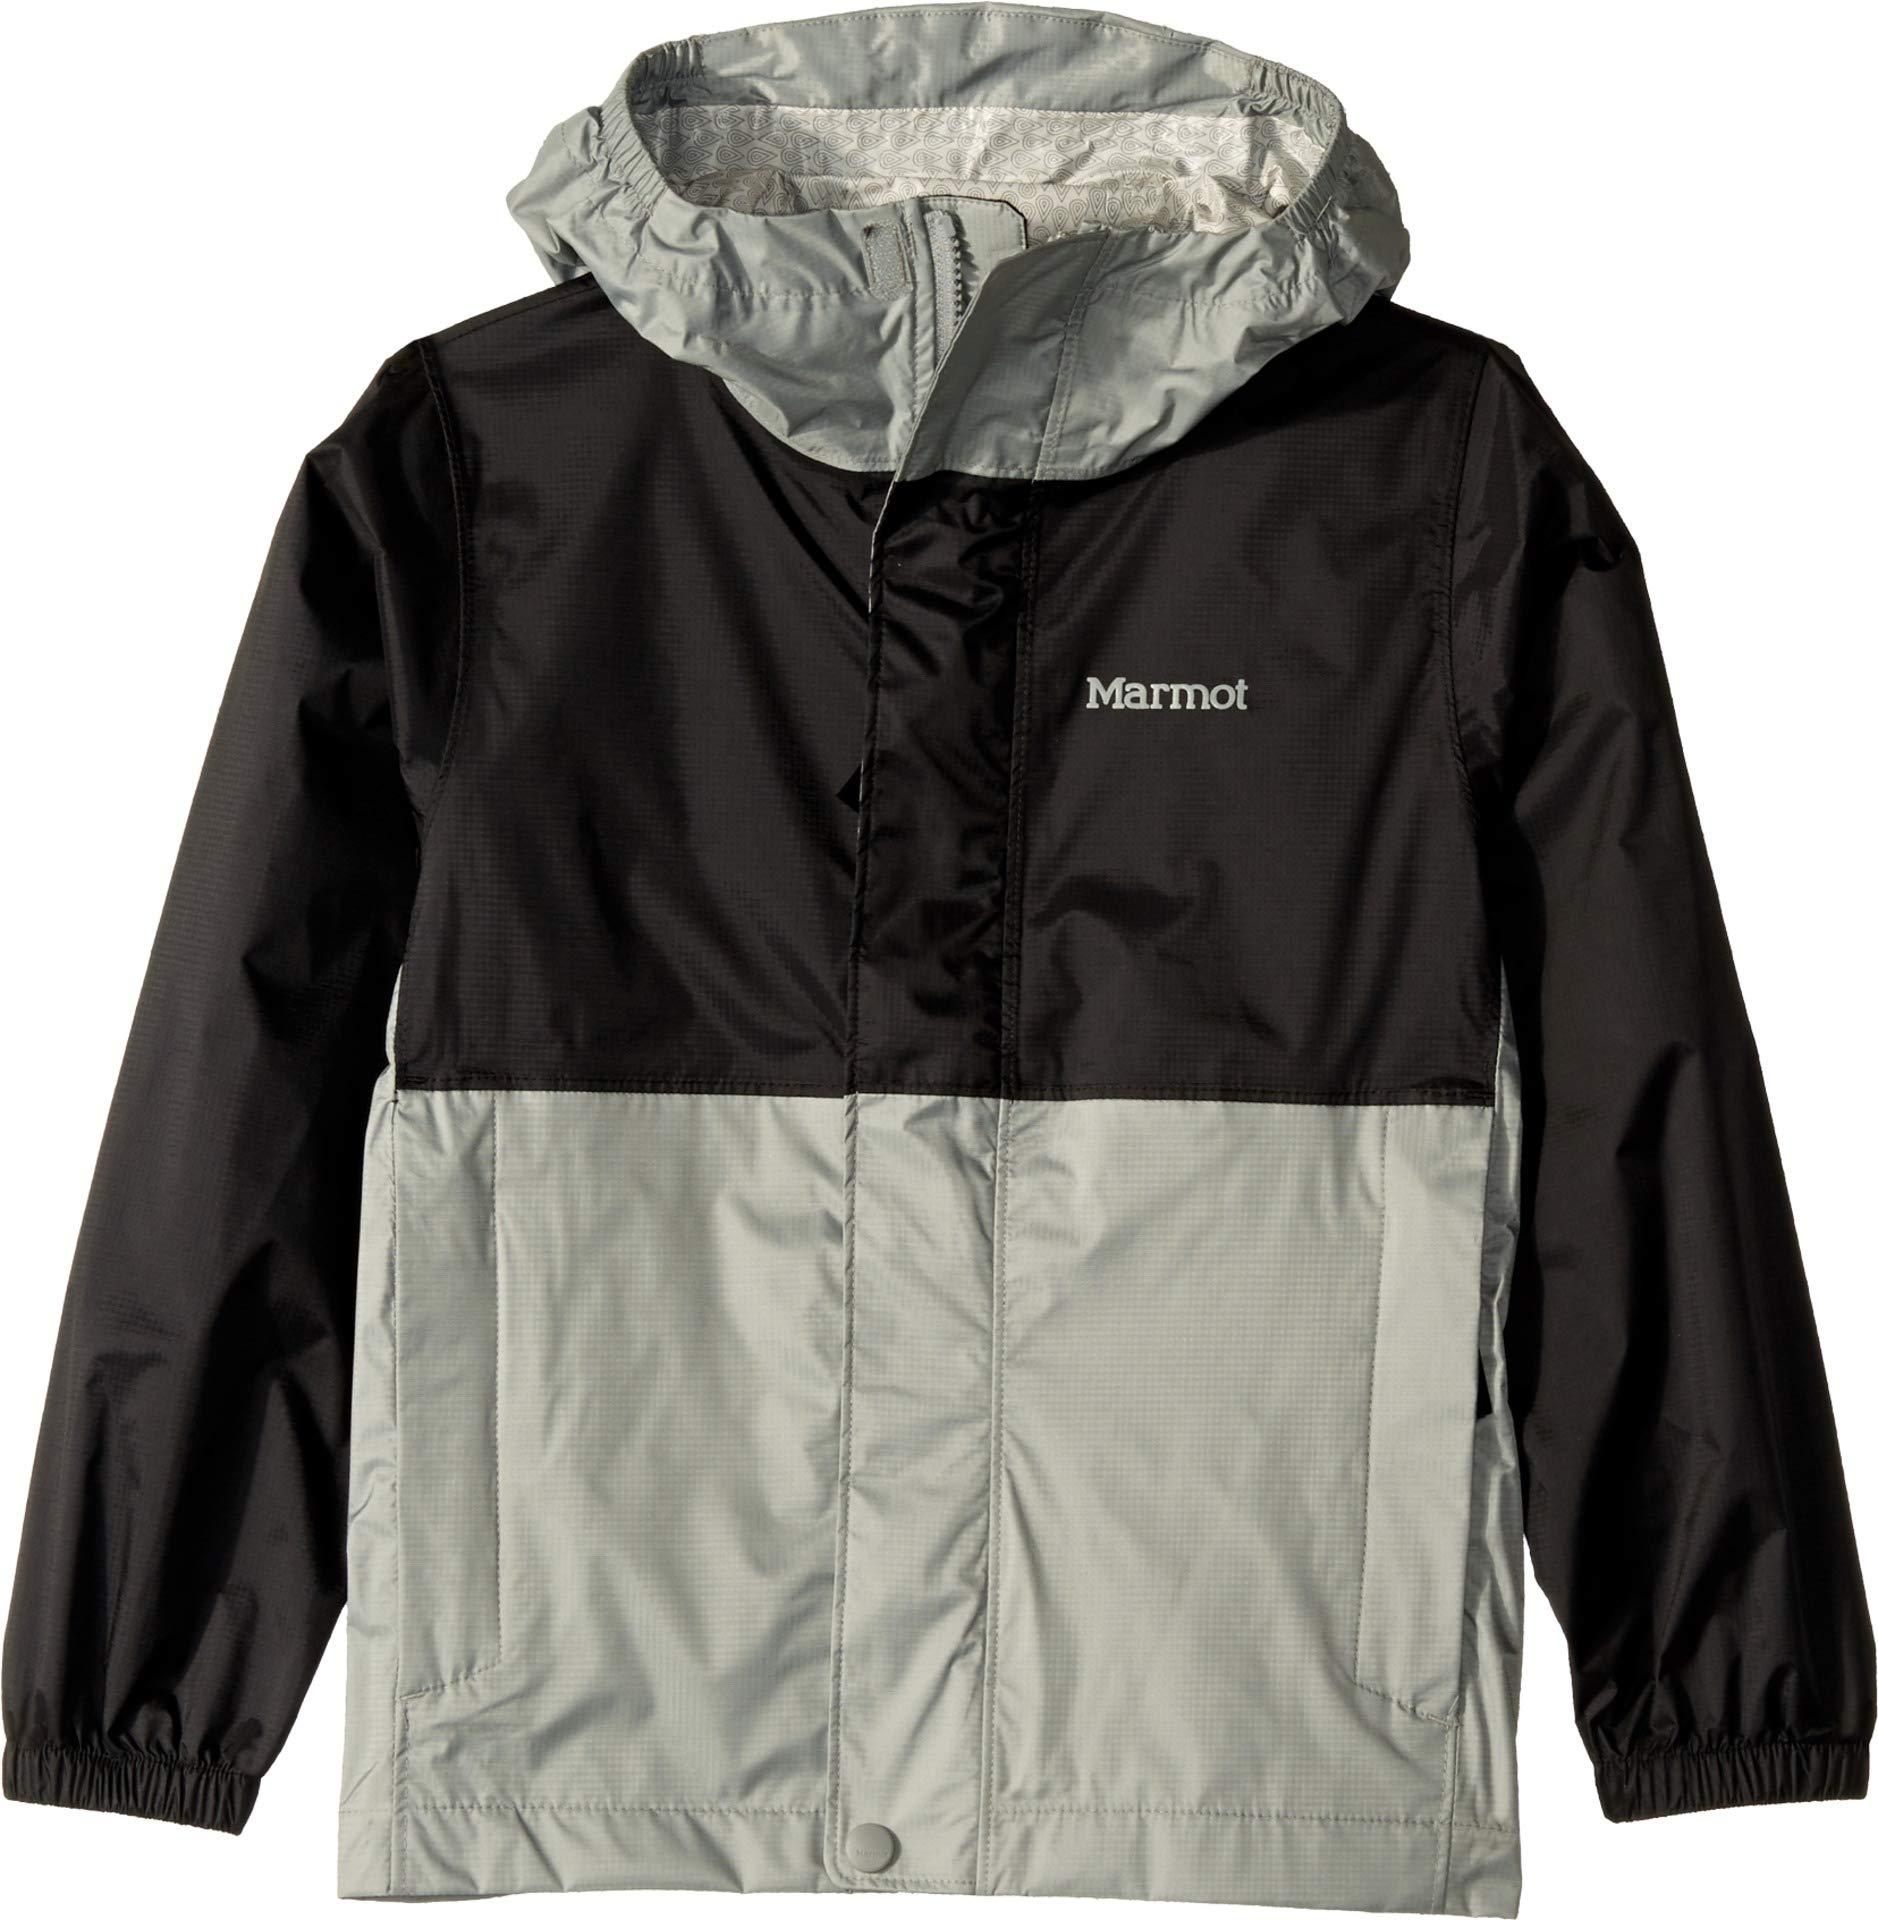 Marmot Kids Boy's PreCip¿ Eco Jacket (Little Kids/Big Kids) Black/Grey Storm Large